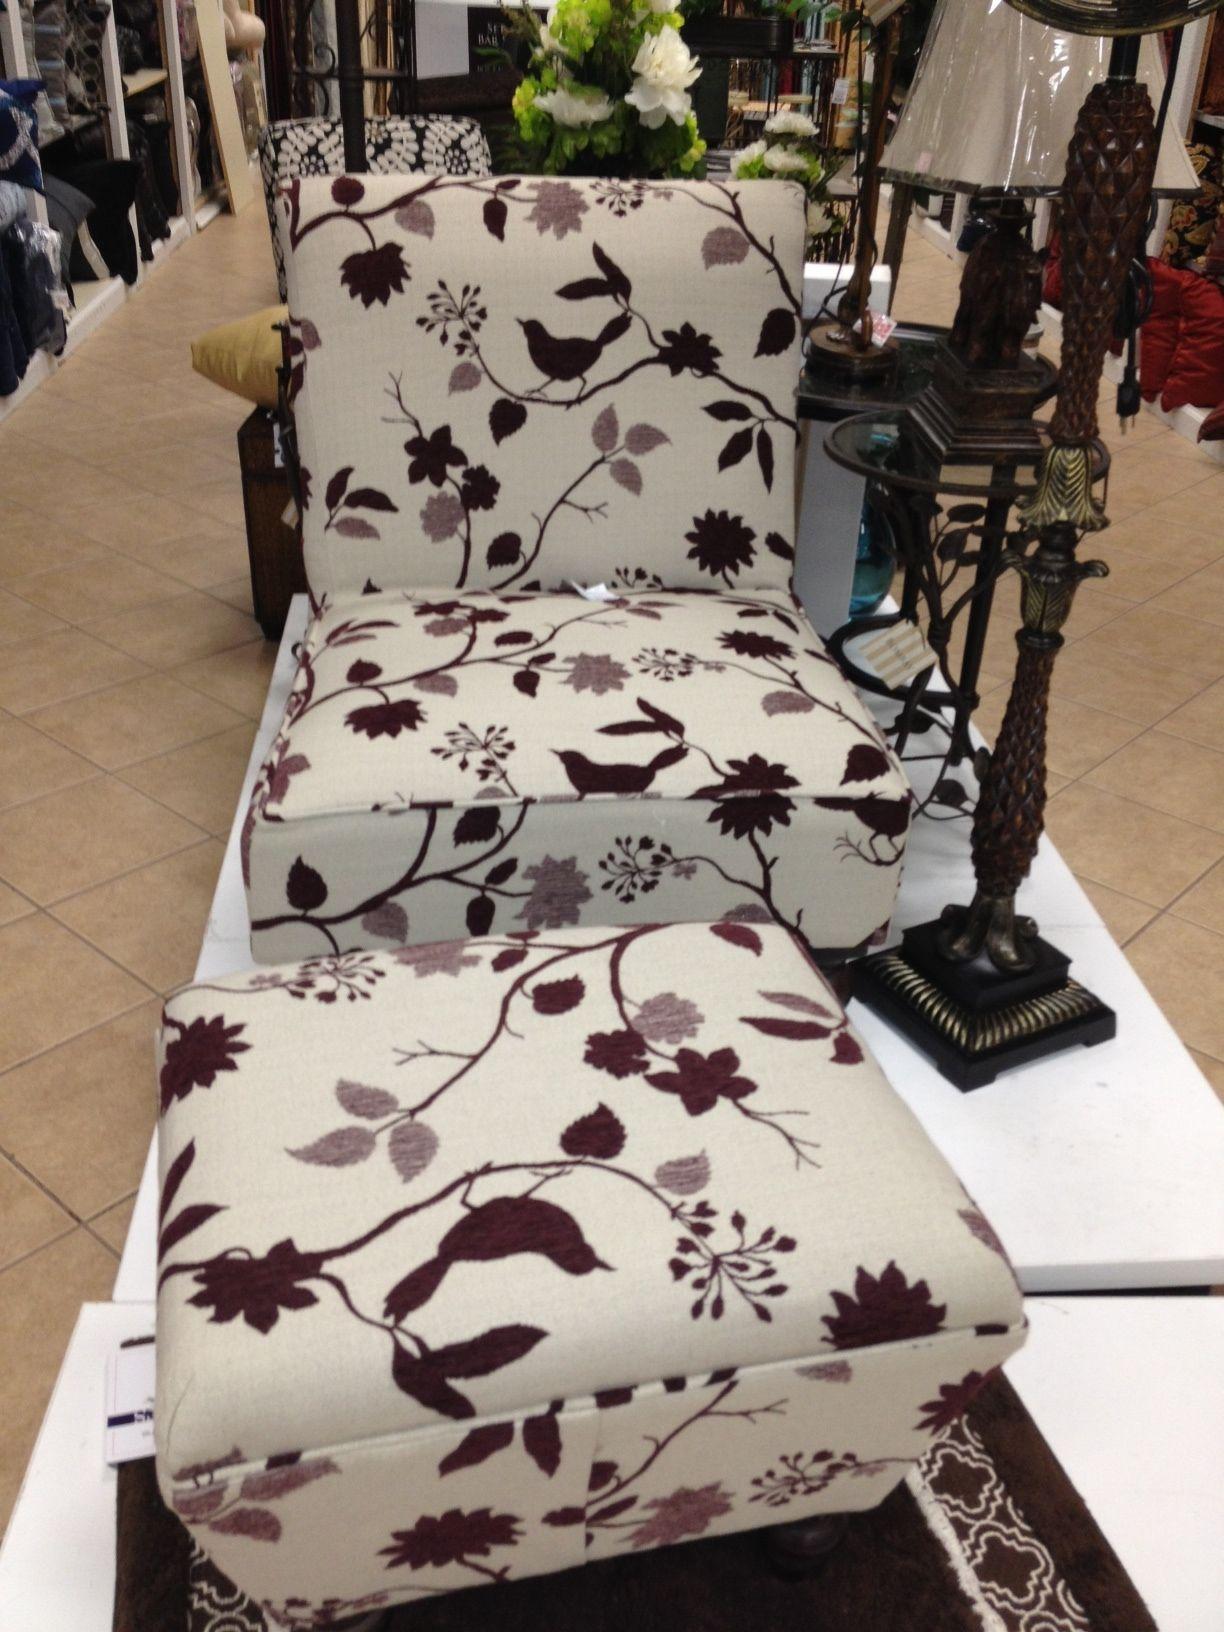 Chair For Office Burlington Coat Factory Factory Decor Home Furniture